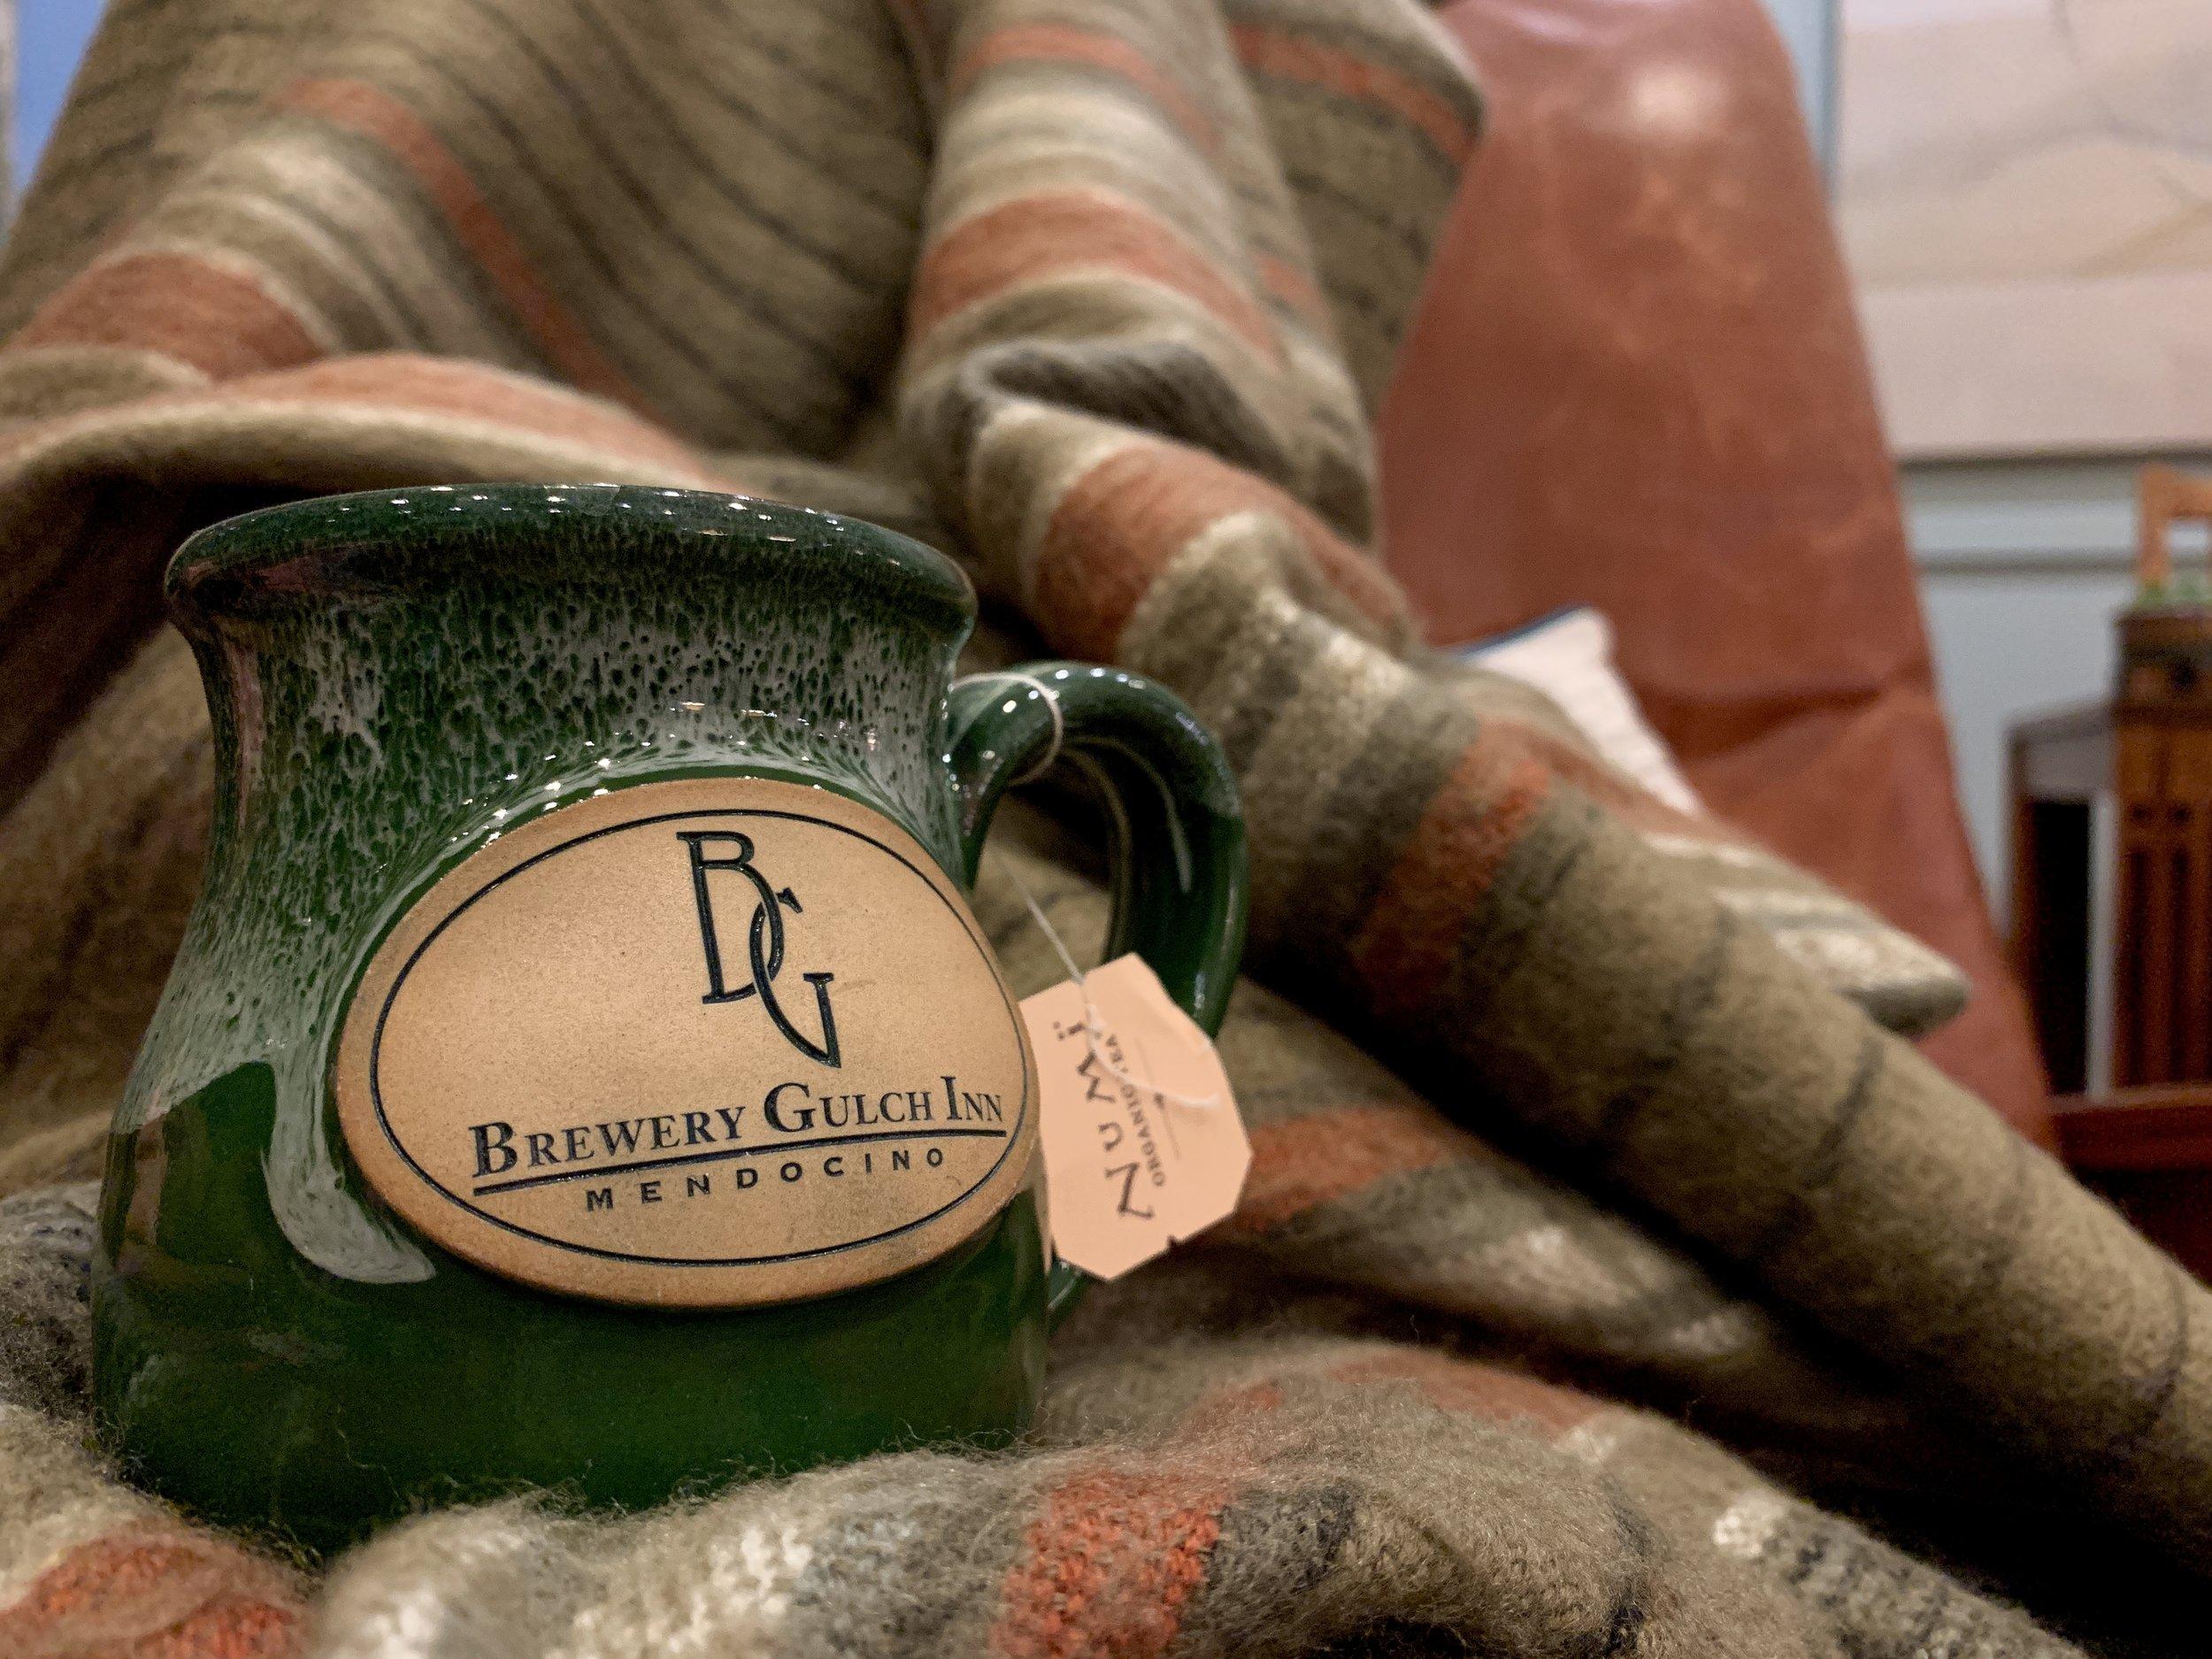 A BGI mug of tea